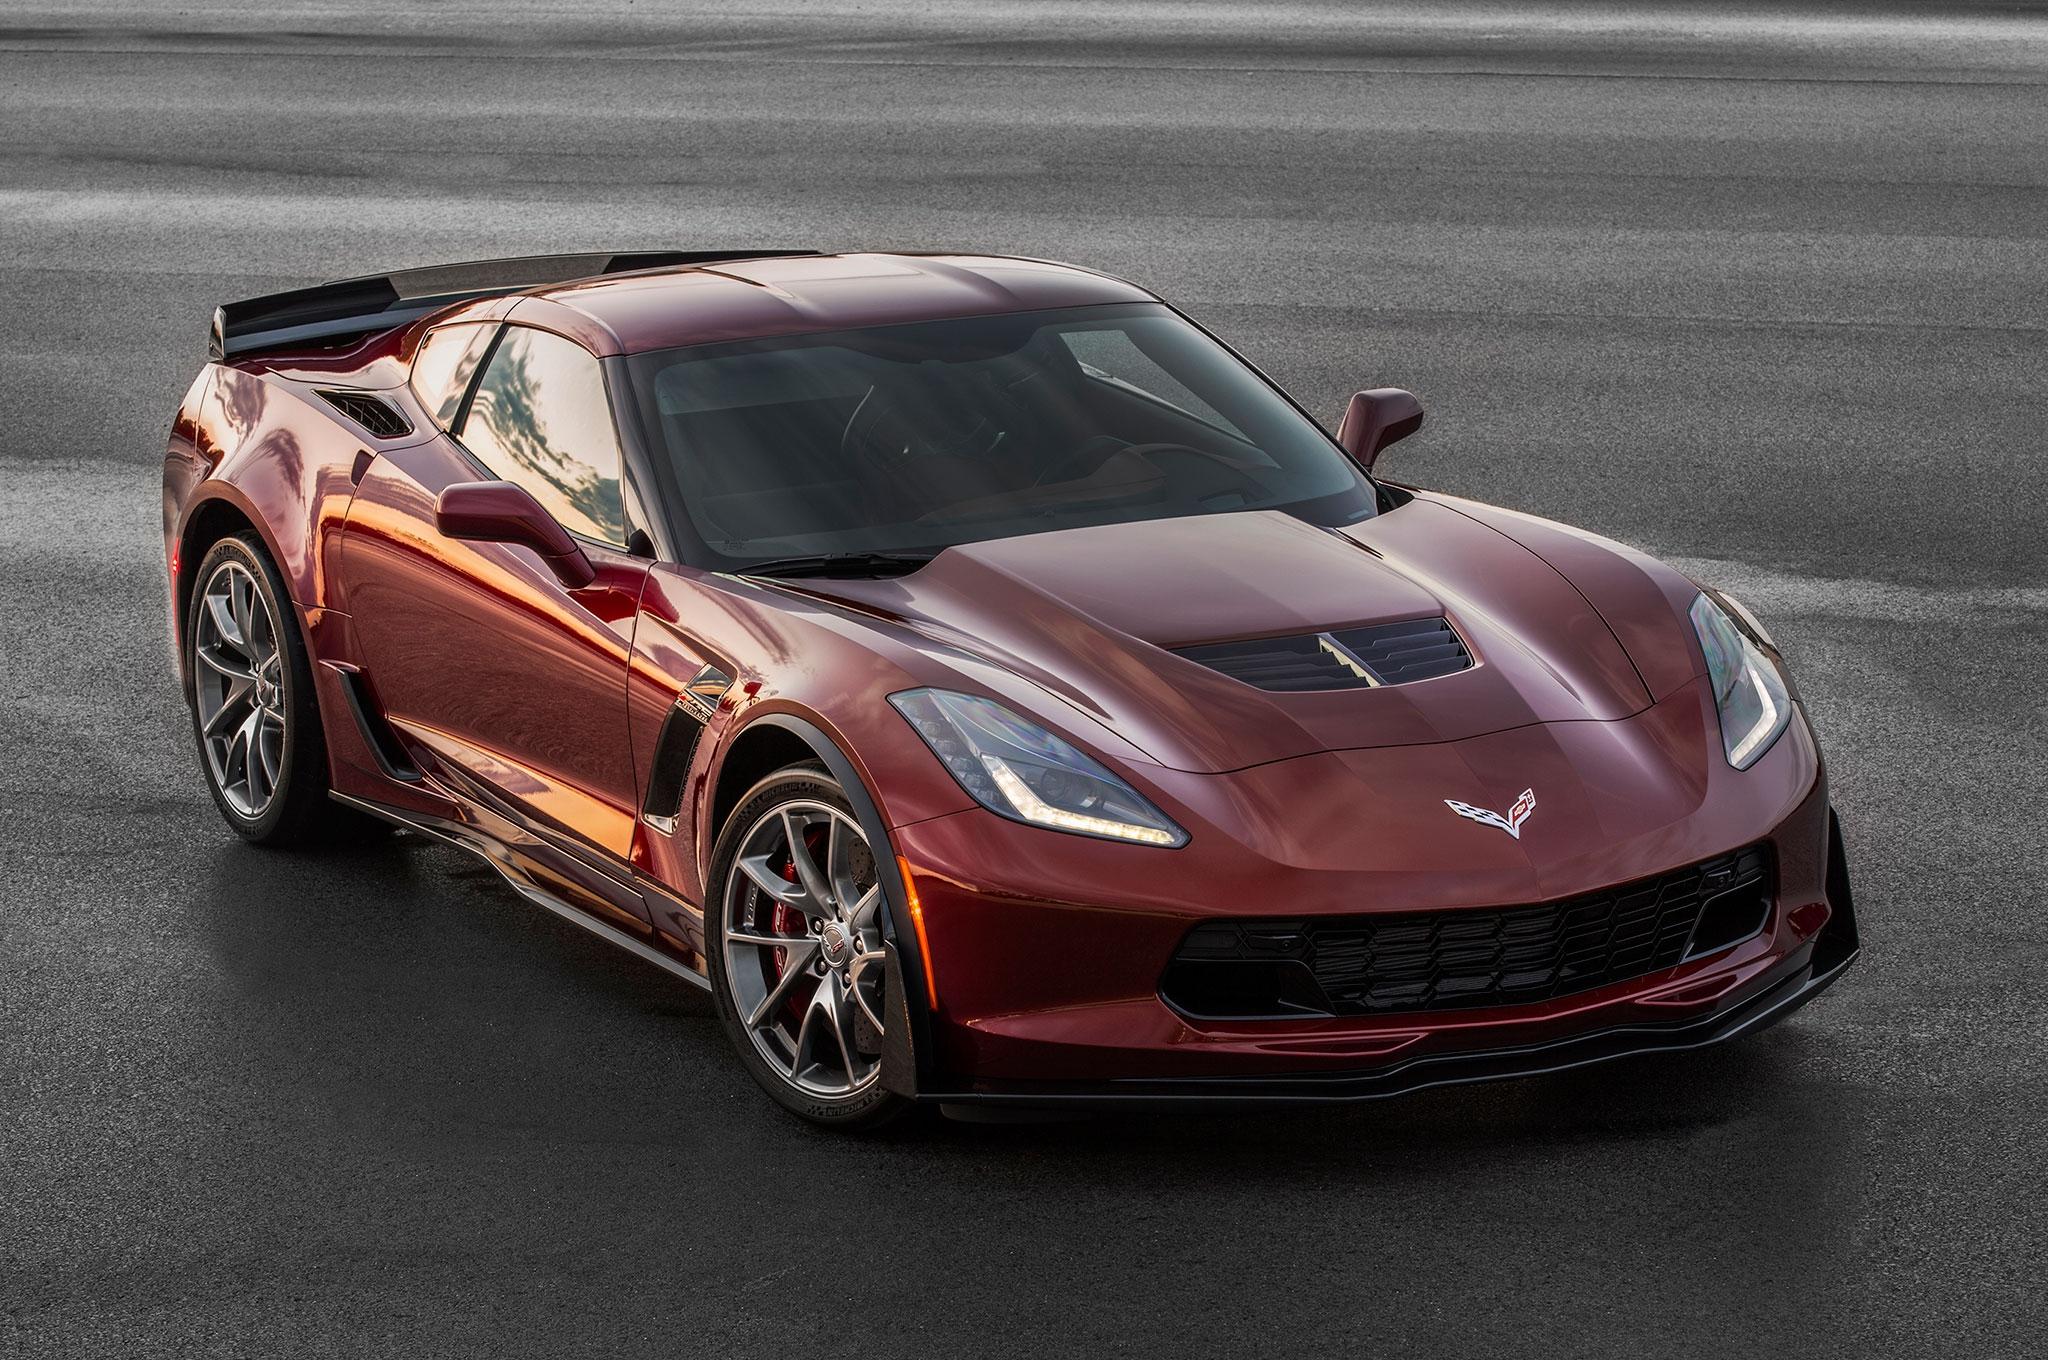 Chevrolet Corvette High Definition Wallpapers